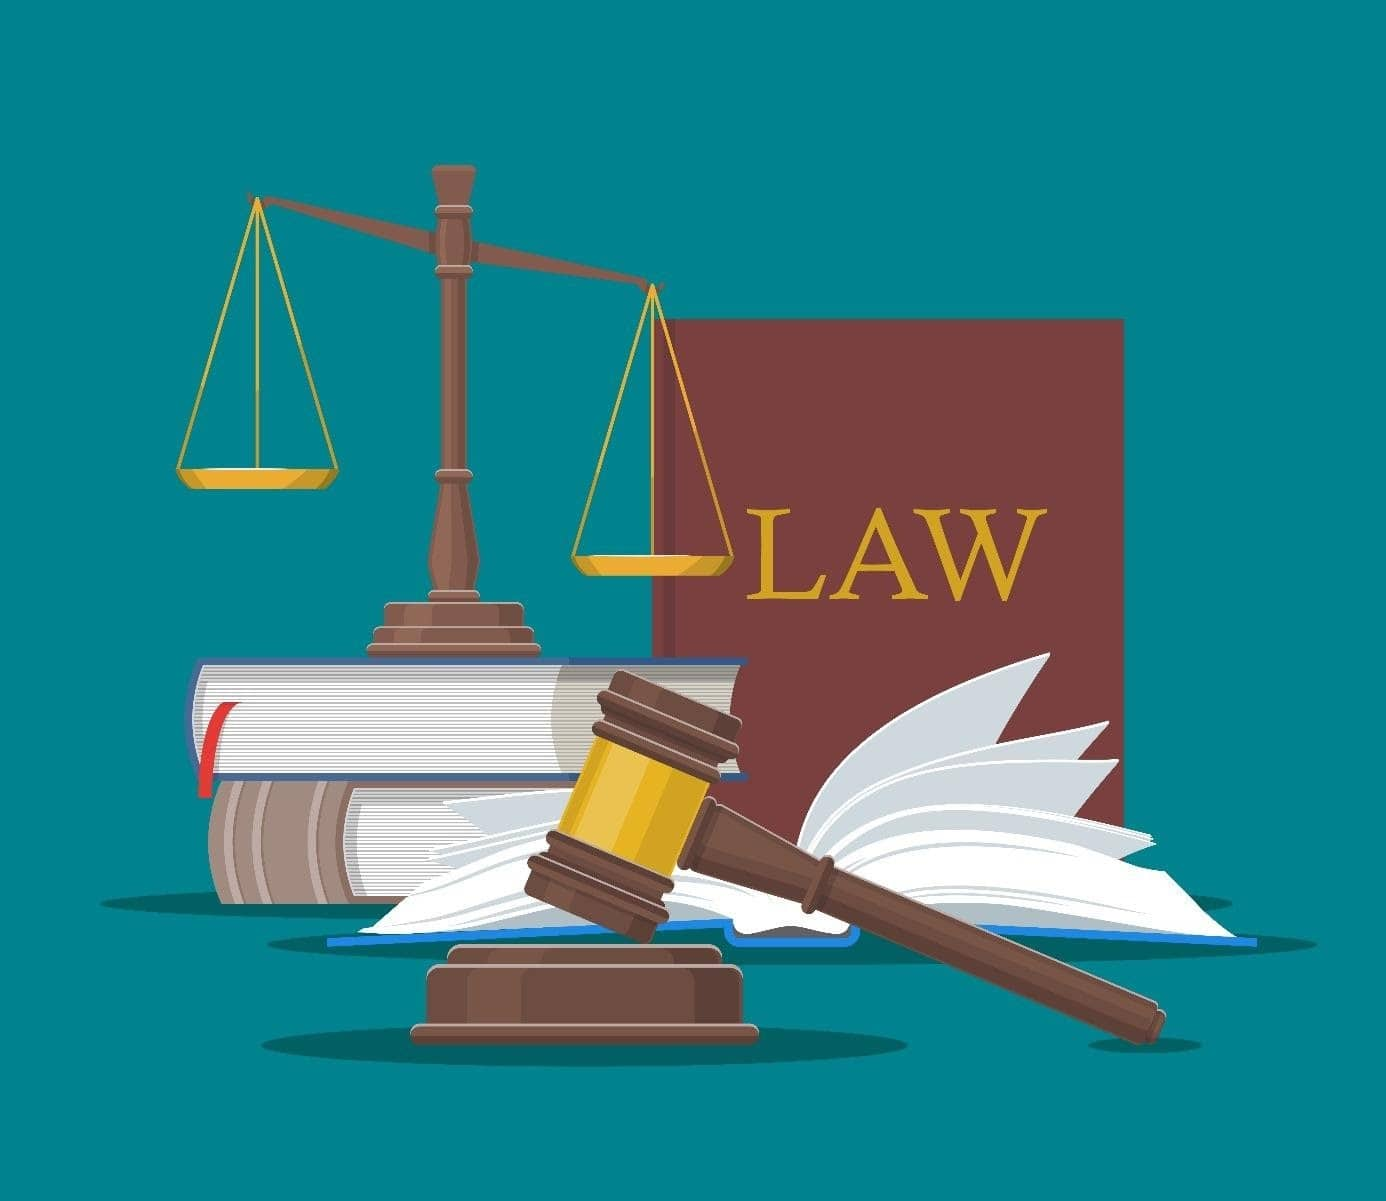 justice livres loi balance marteau